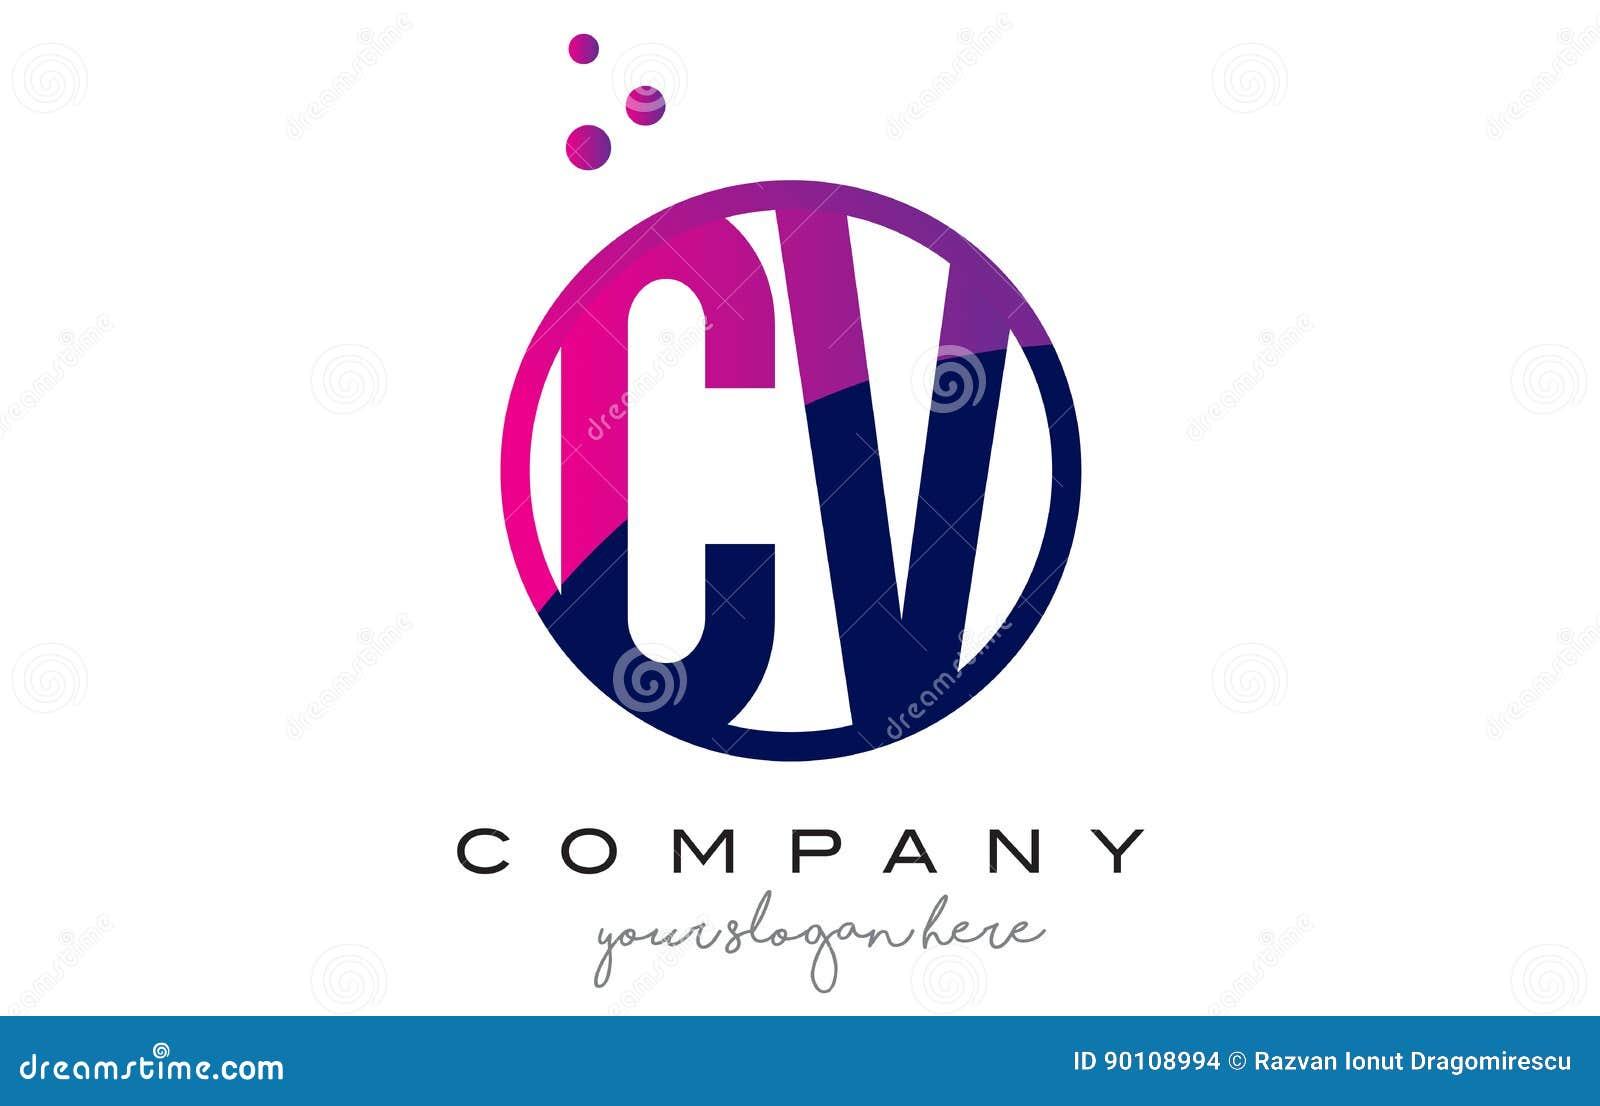 cv c v circle letter logo design with purple dots bubbles stock vector